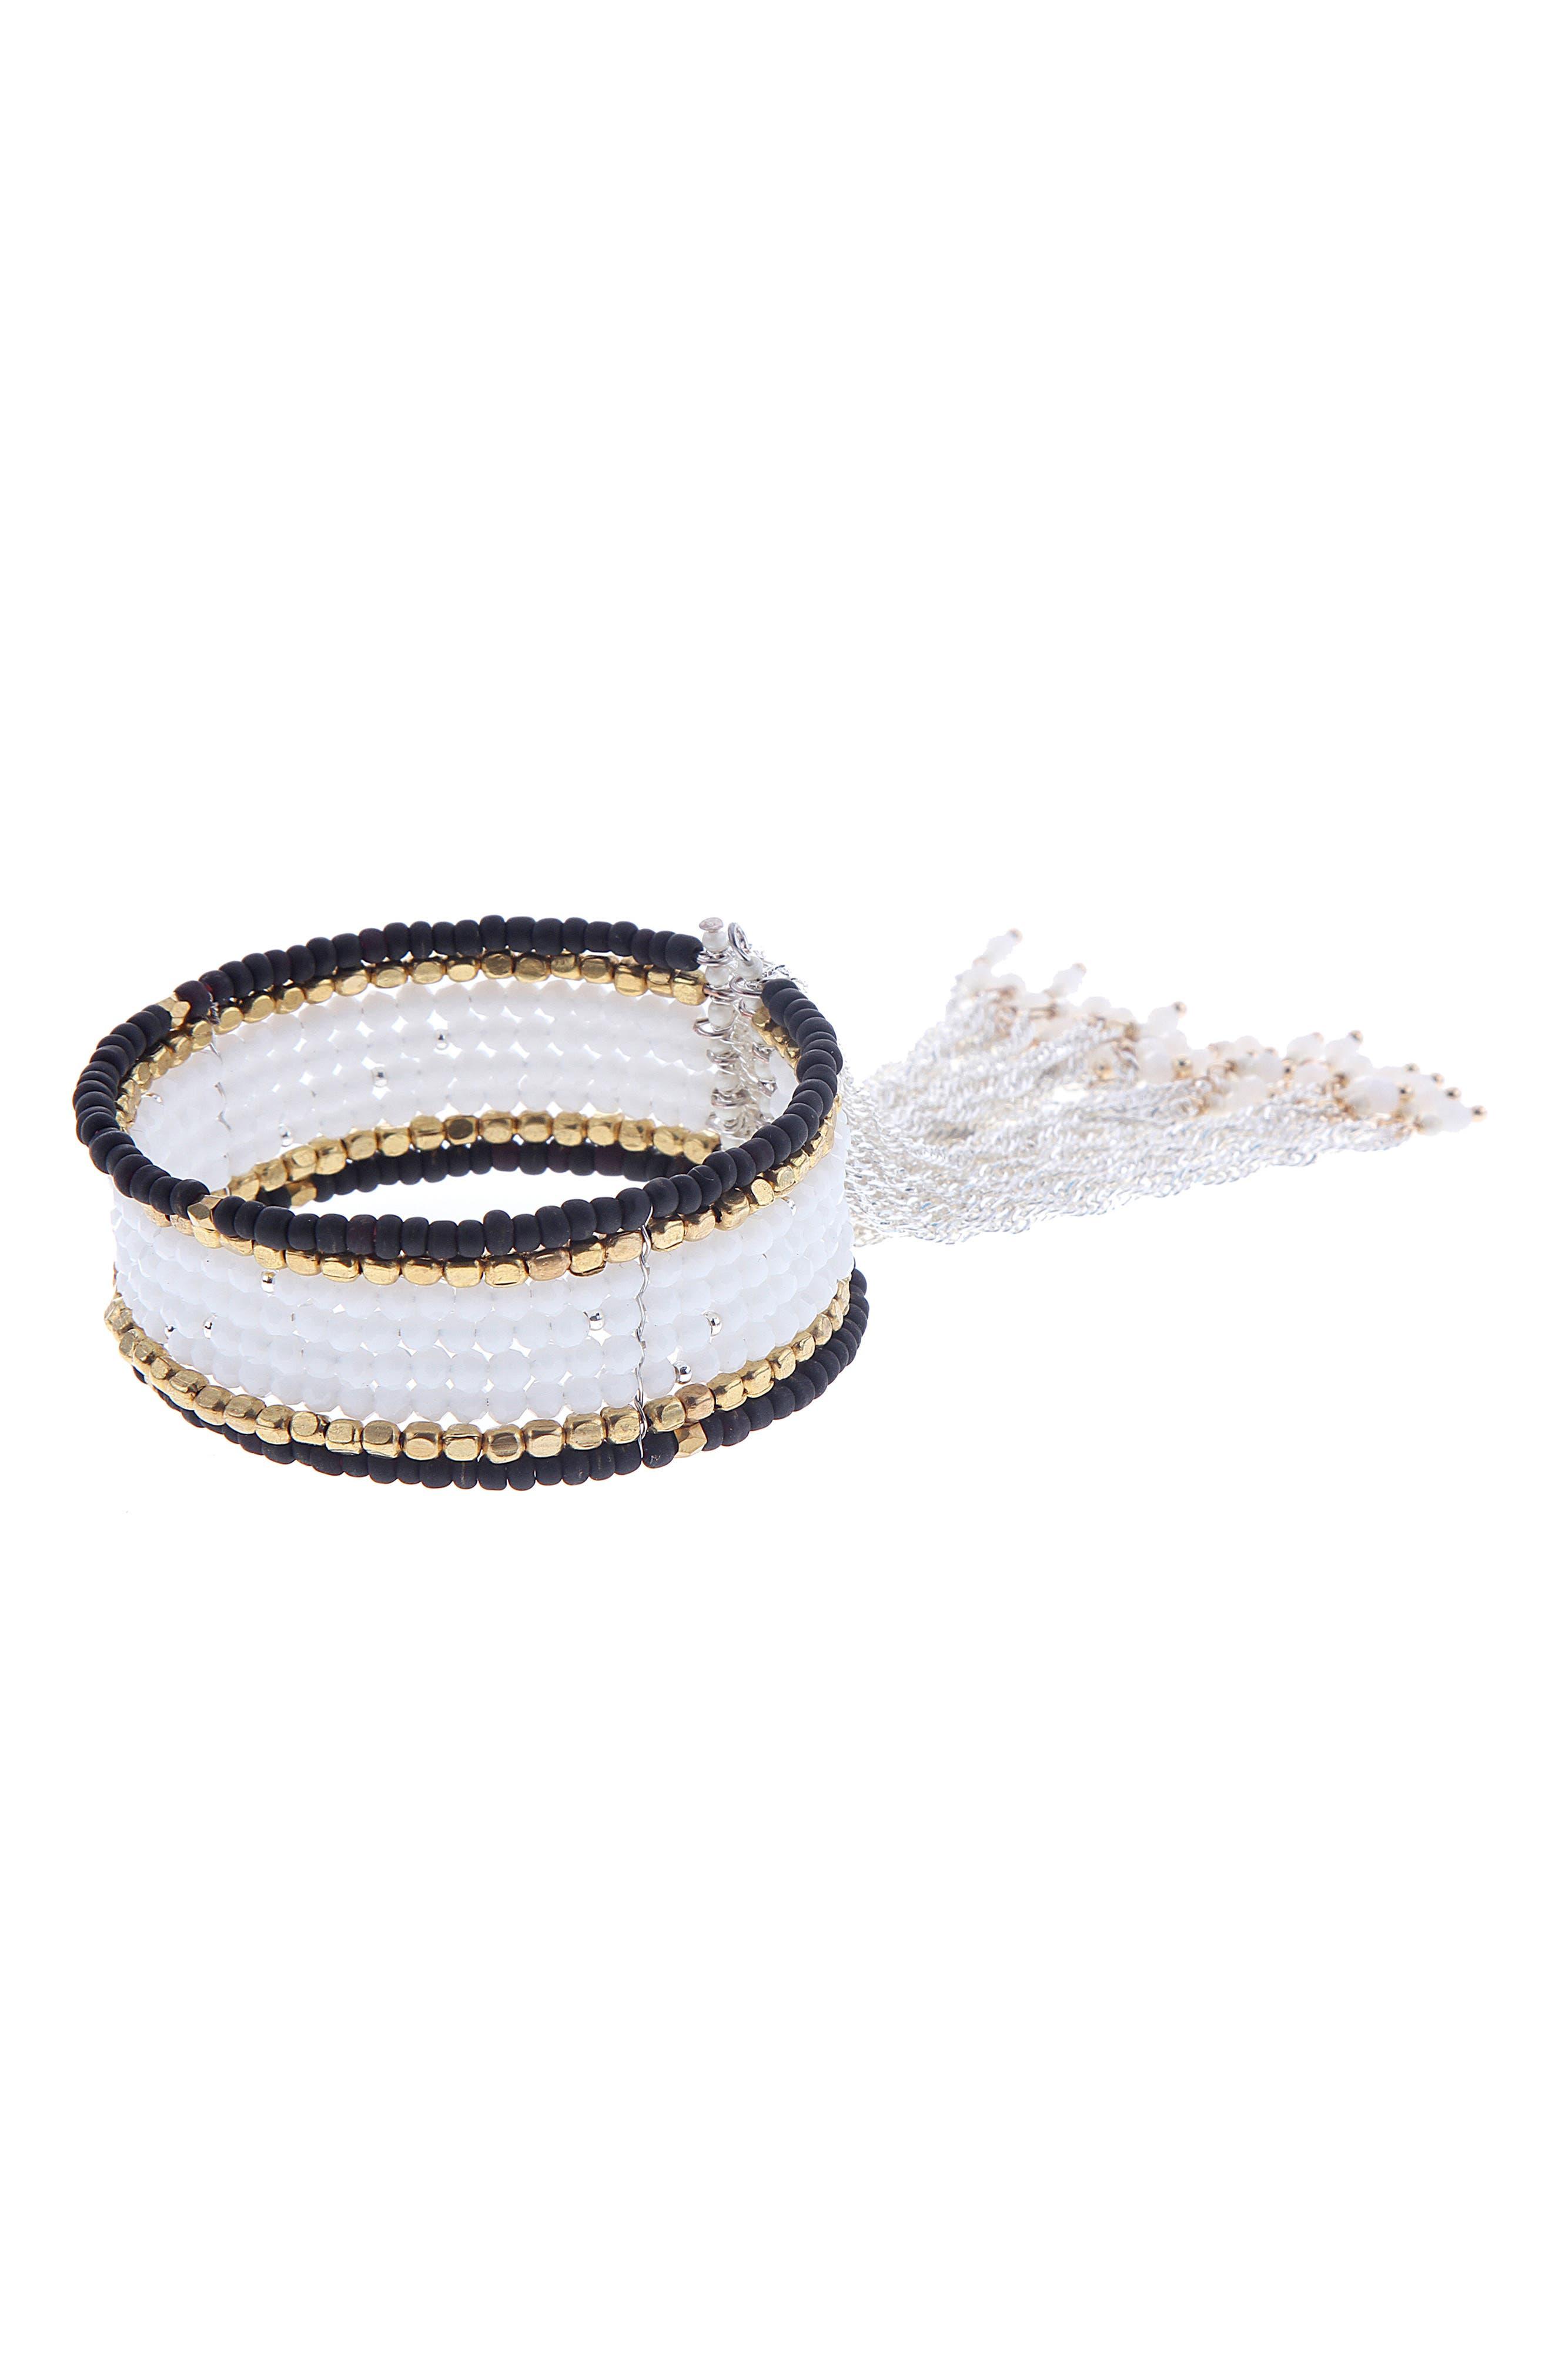 Beaded Chain Tassel Cuff Bracelet,                         Main,                         color, White/ Black